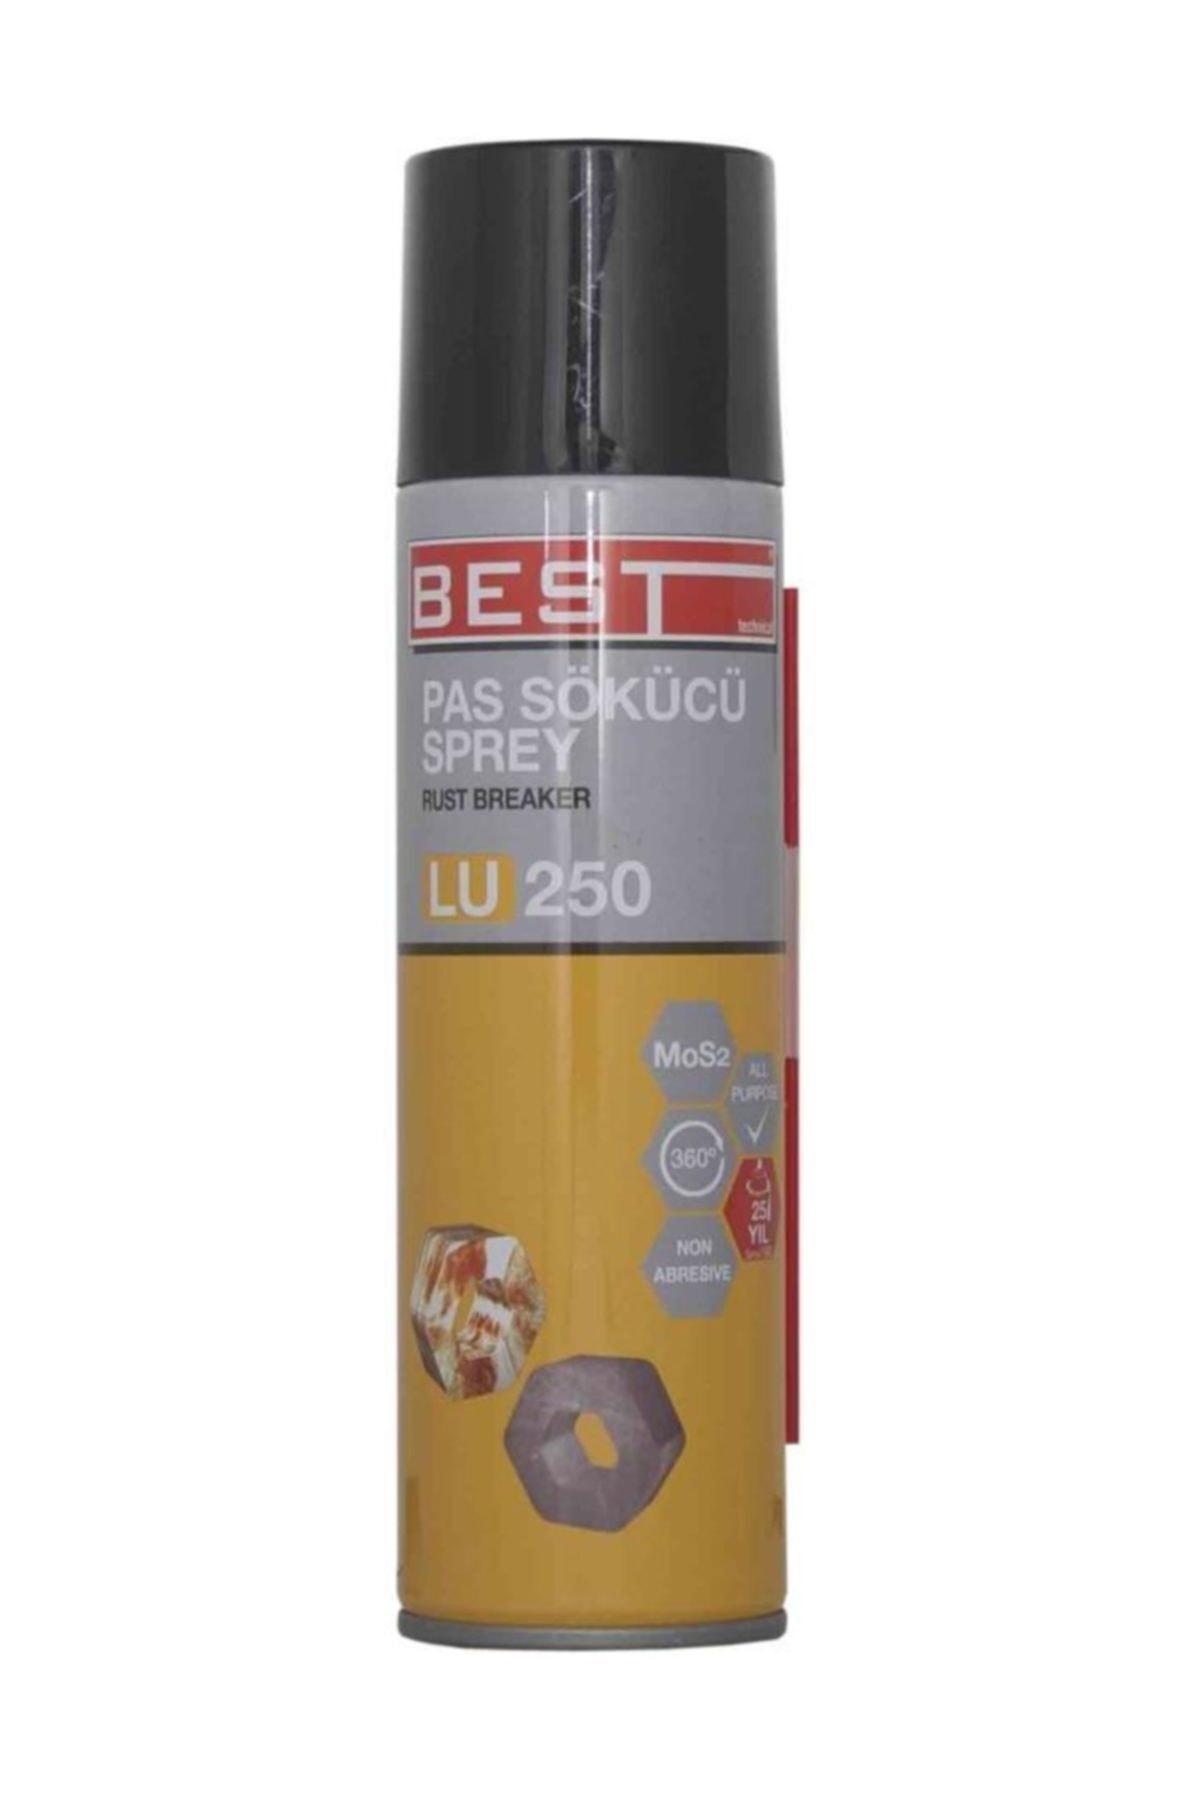 Best Pas Sökücü Spray 250 ml 1 Adet 1